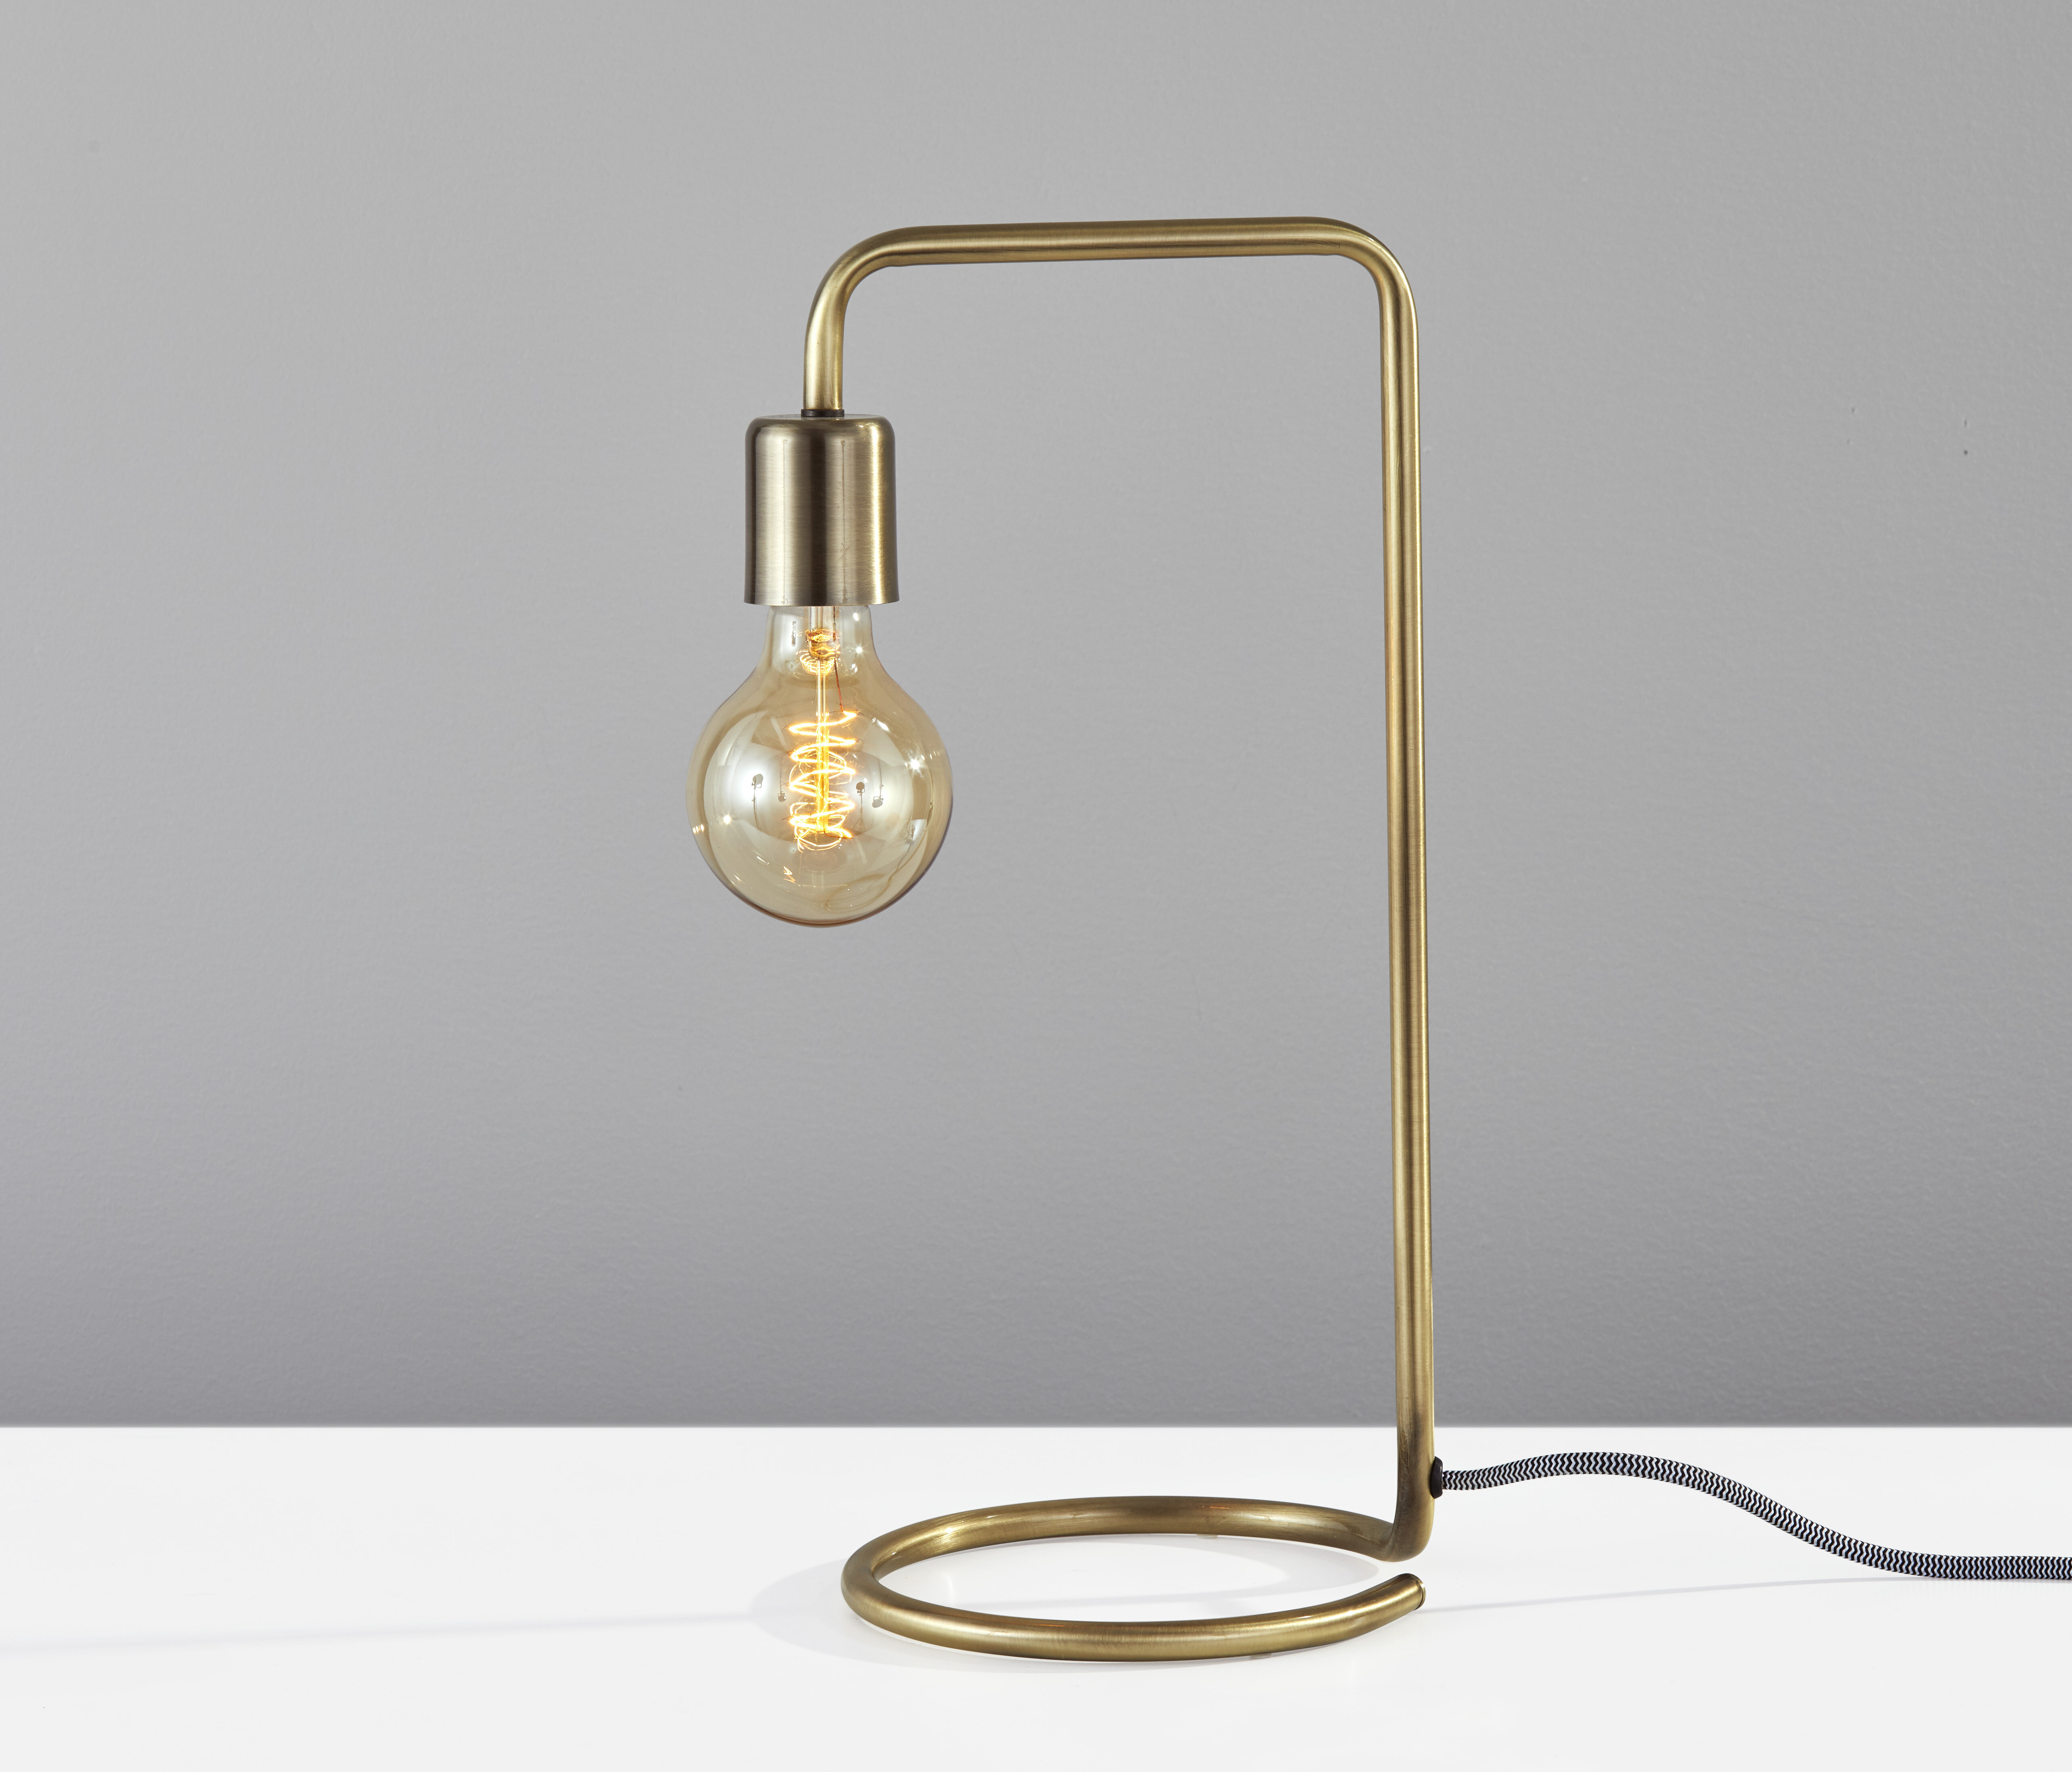 Heisler 17 Arched Table Lamp Allmodern